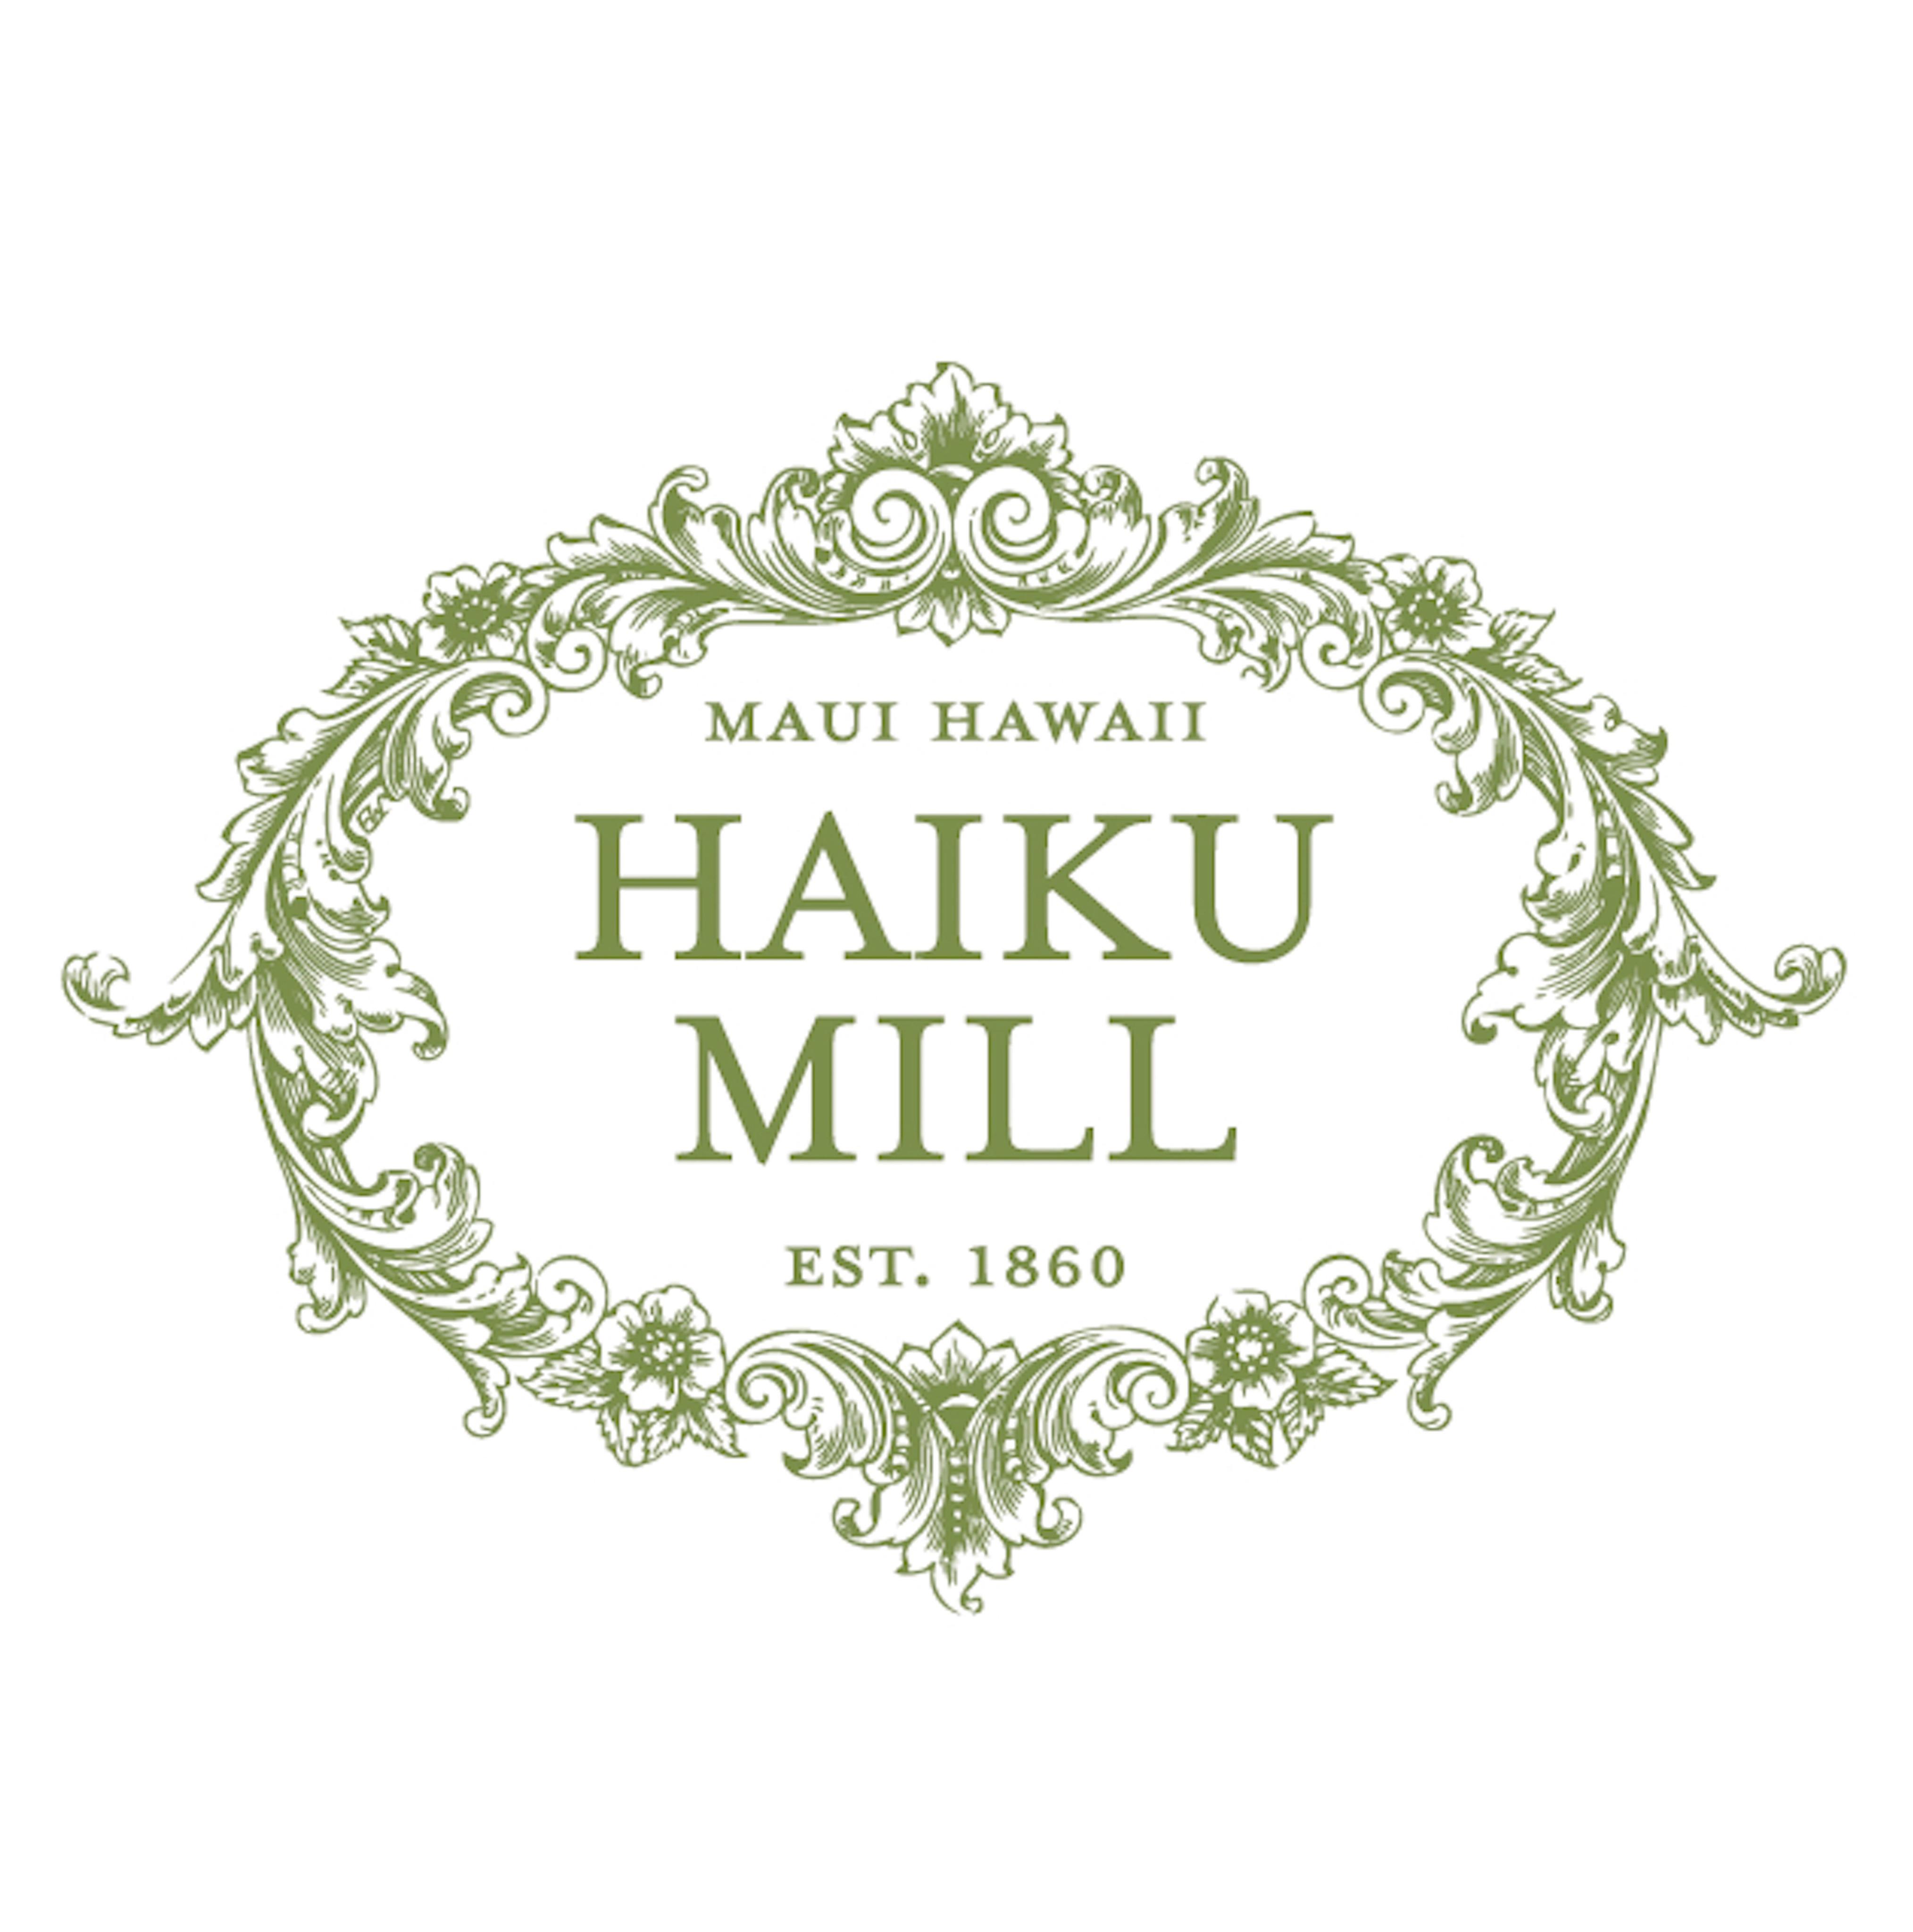 Intimate Haiku Mill Wedding - Haiku Mill